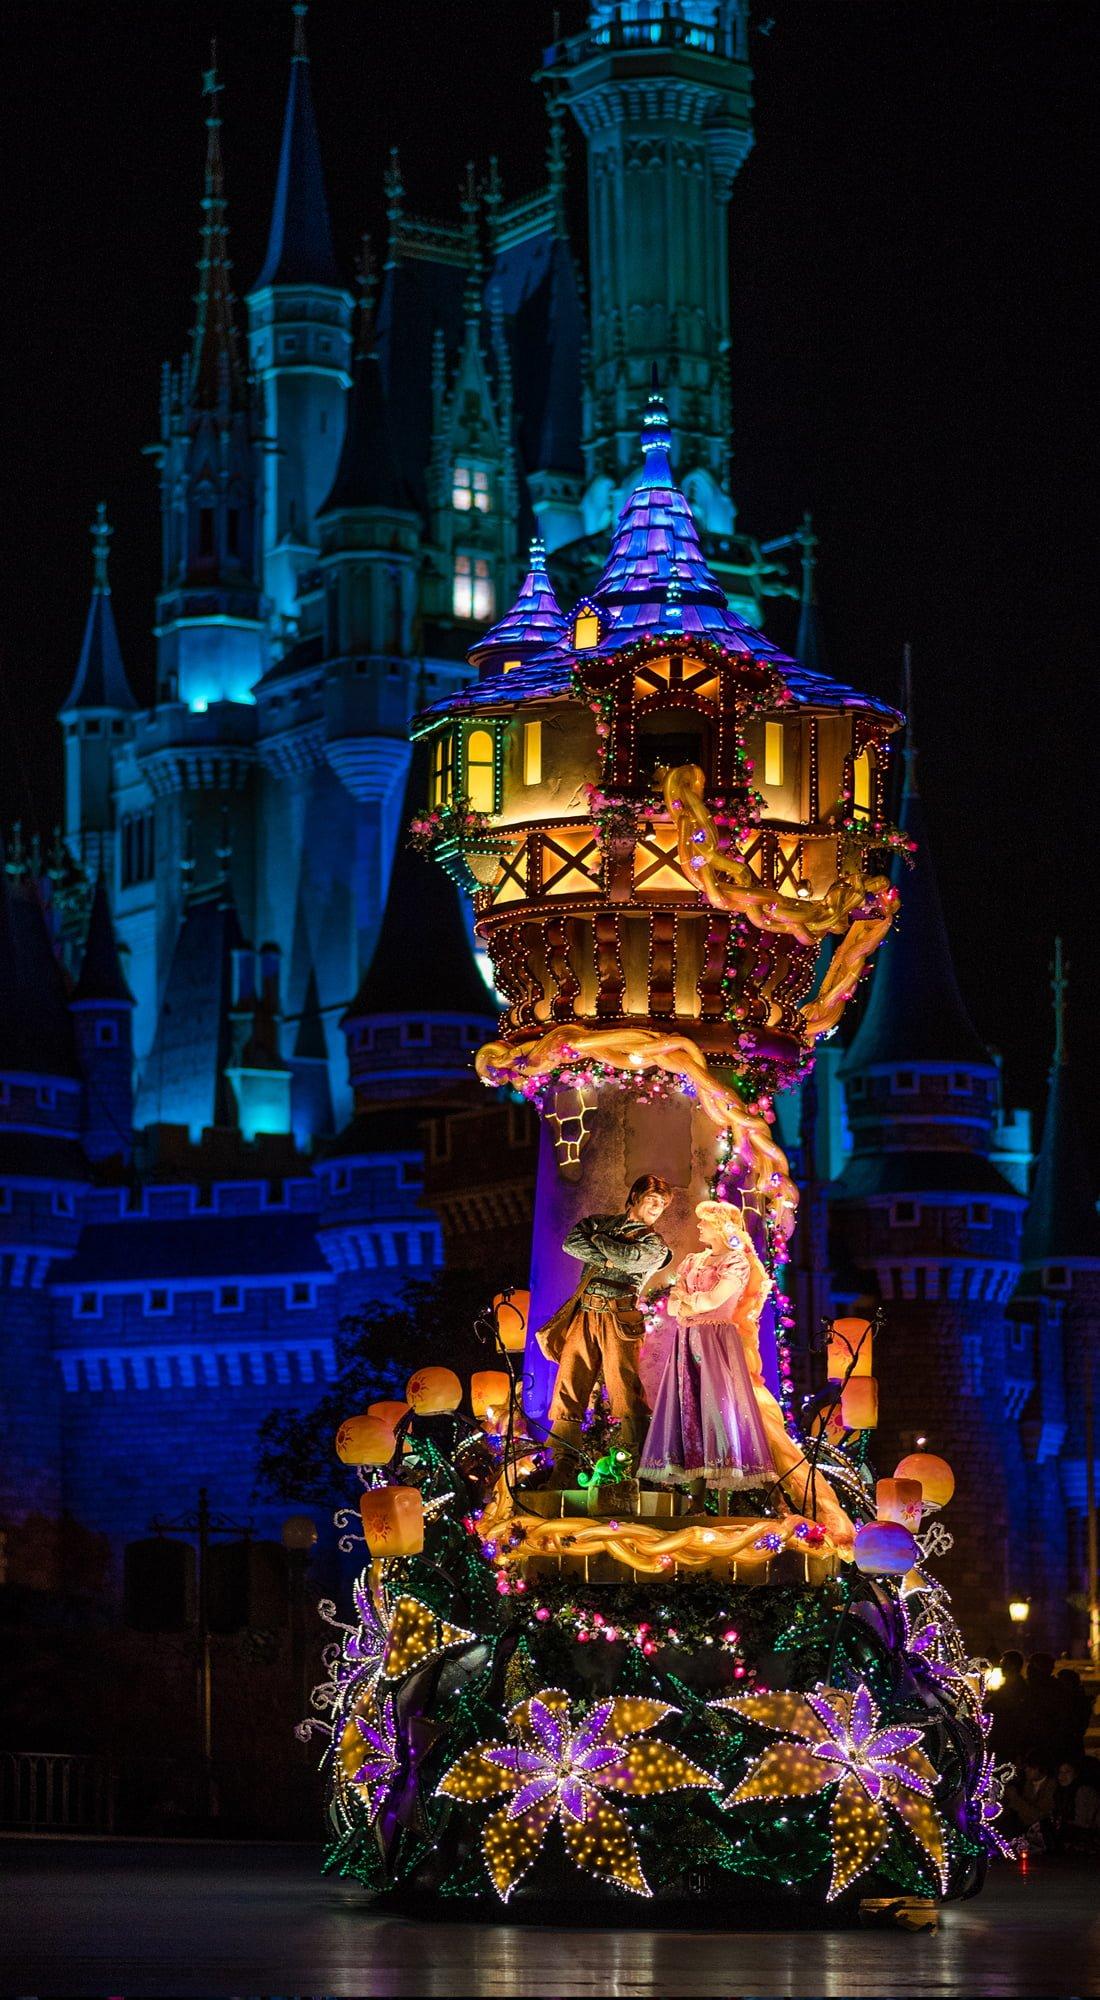 Haunted Mansion Iphone Wallpaper Free Disney Iphone Wallpapers Disney Tourist Blog